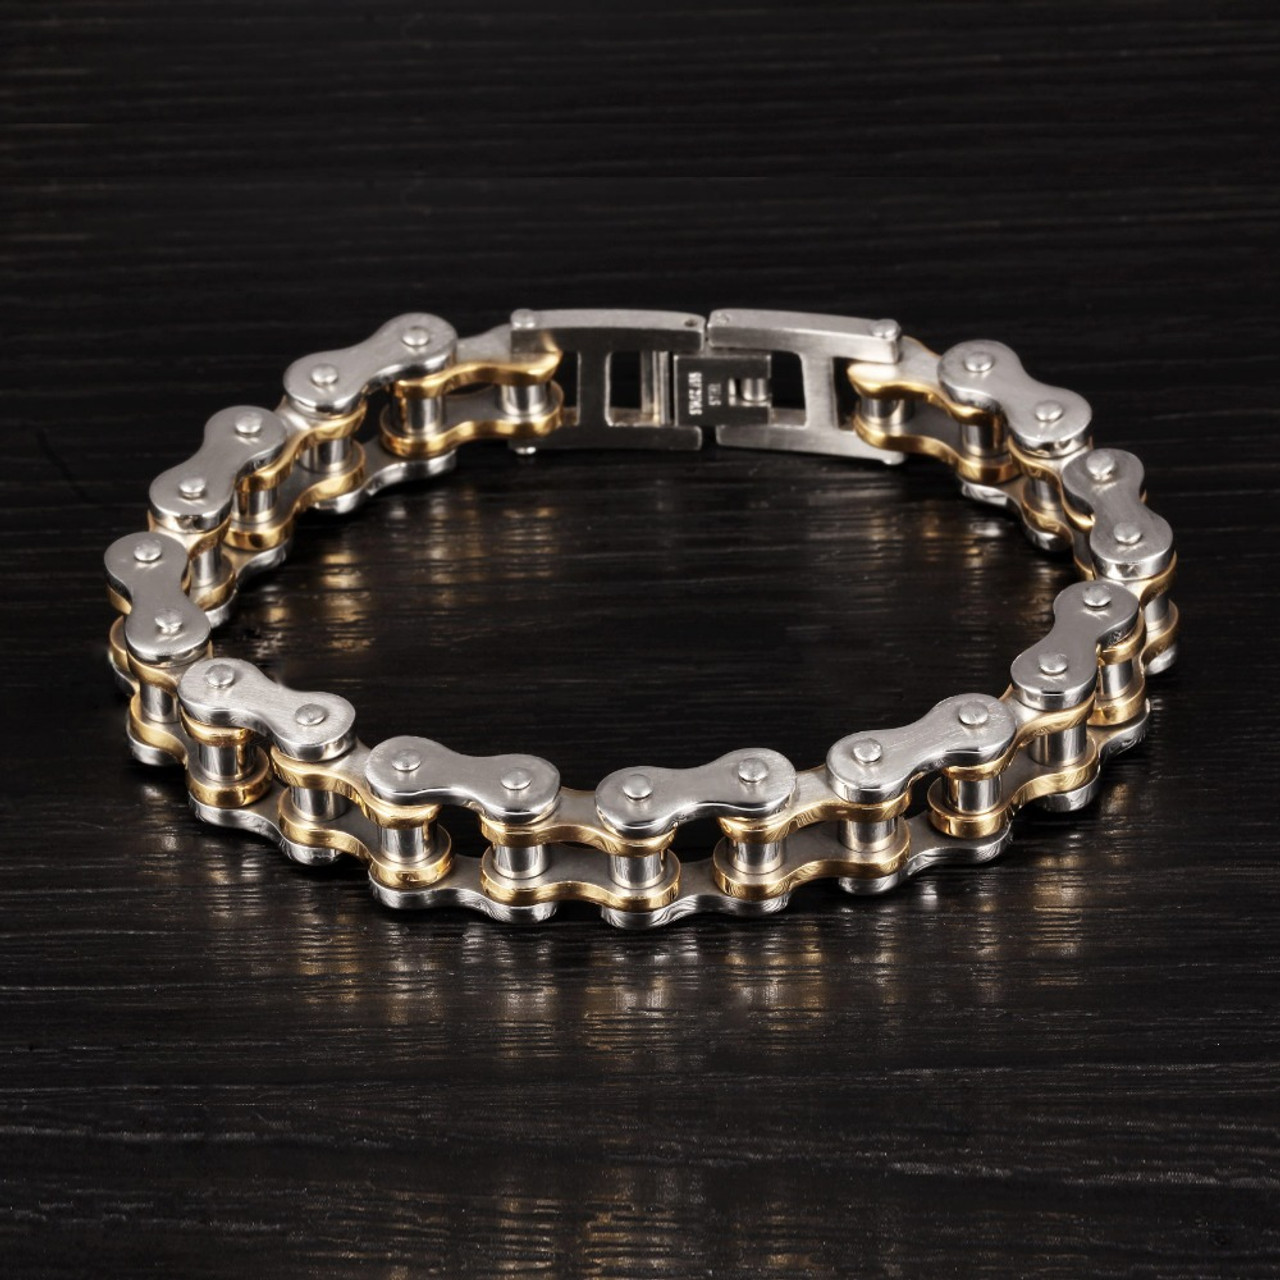 f09a4374cda69 Cool Men Biker Bicycle Motorcycle Chain Men's Bracelets & Bangles Fashion 4  Color 316L Stainless Steel Jewelry,JM781J